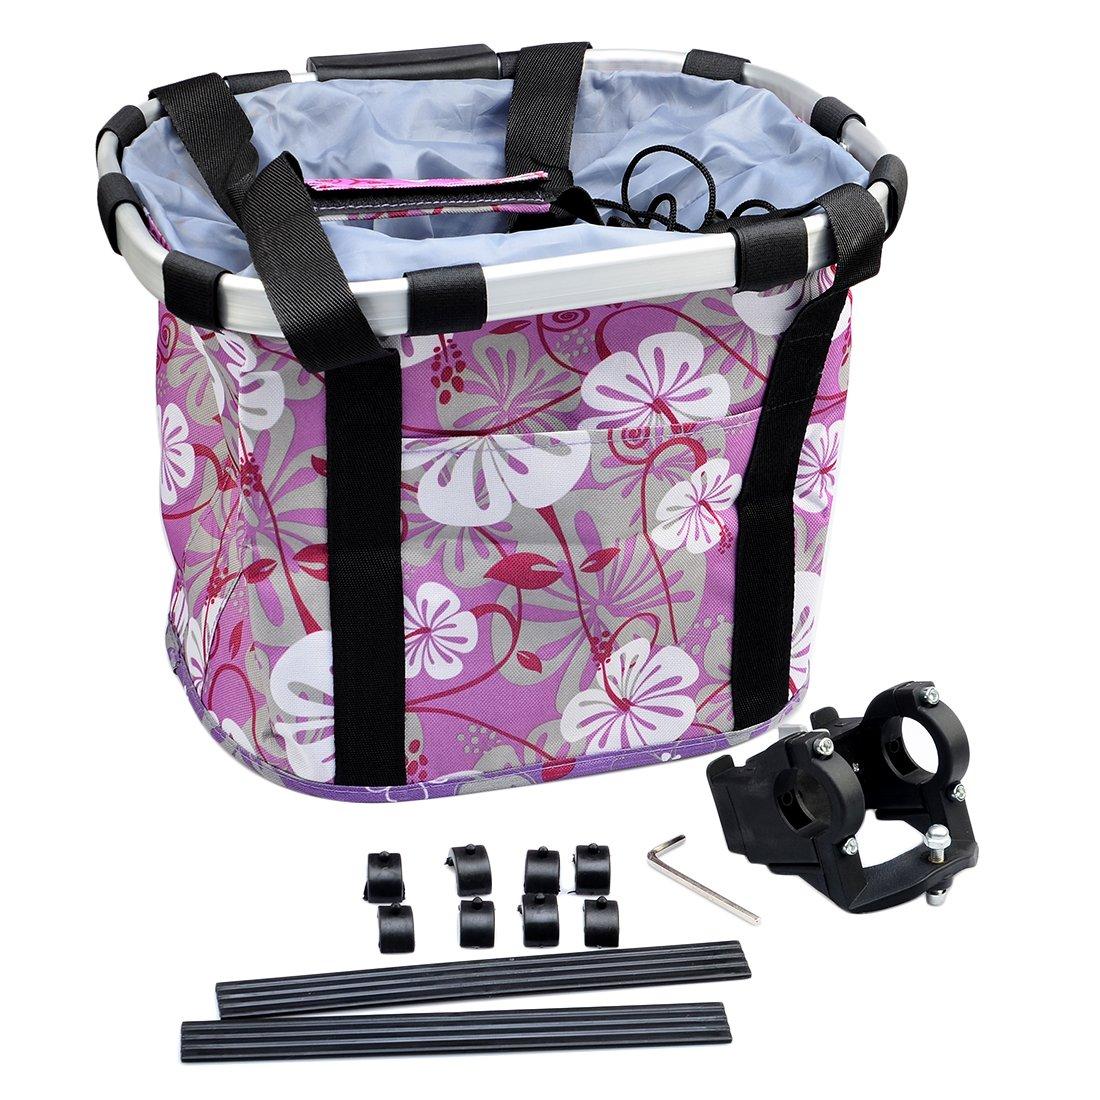 Quick Release Bicycle Bike Basket Fcoson Multi Purpose Picnic Storage Bag Purple Flower